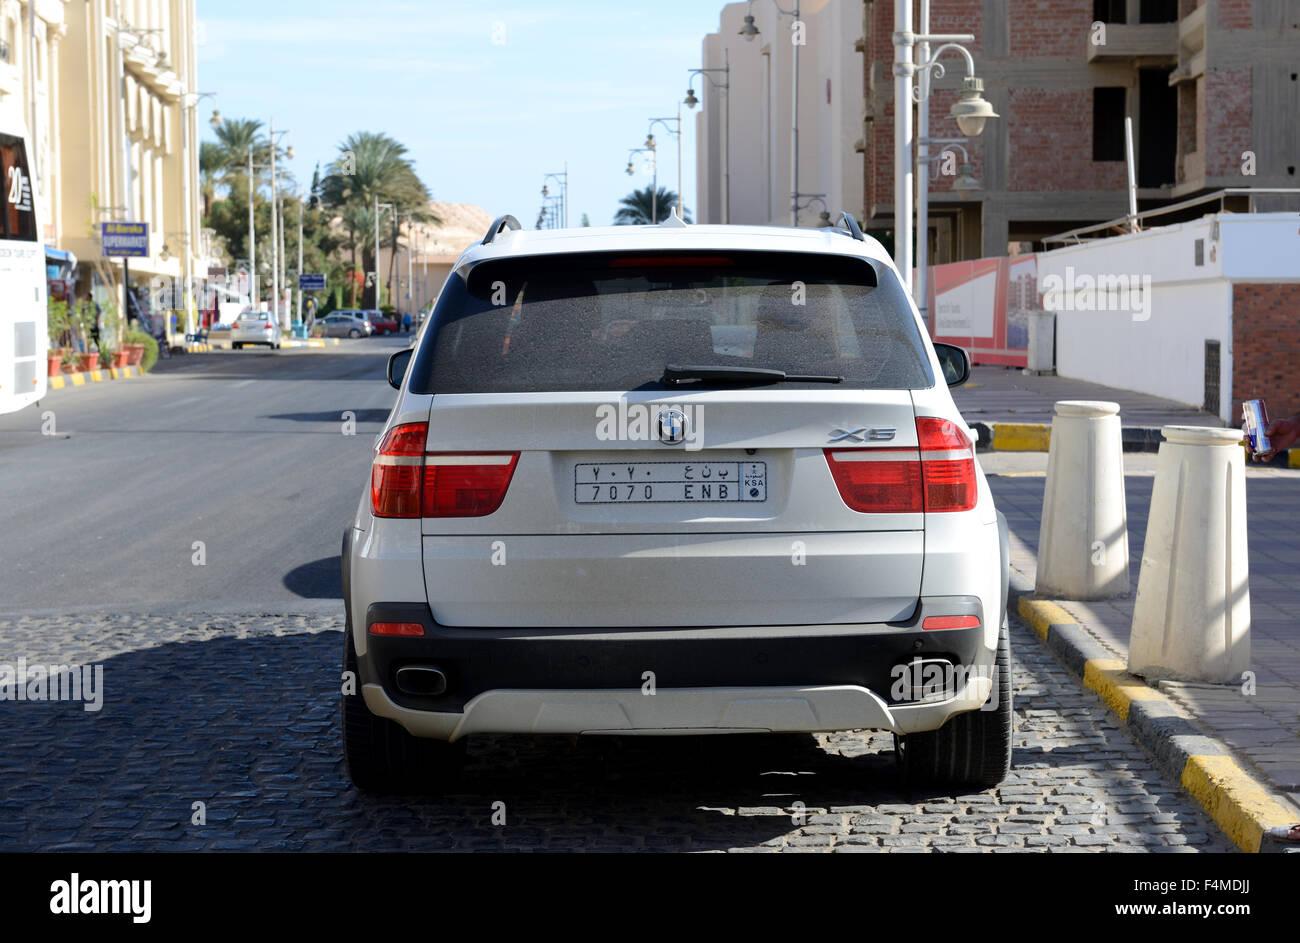 The BMW X5 parked near luxury hotel, Hurghada, Egypt - Stock Image